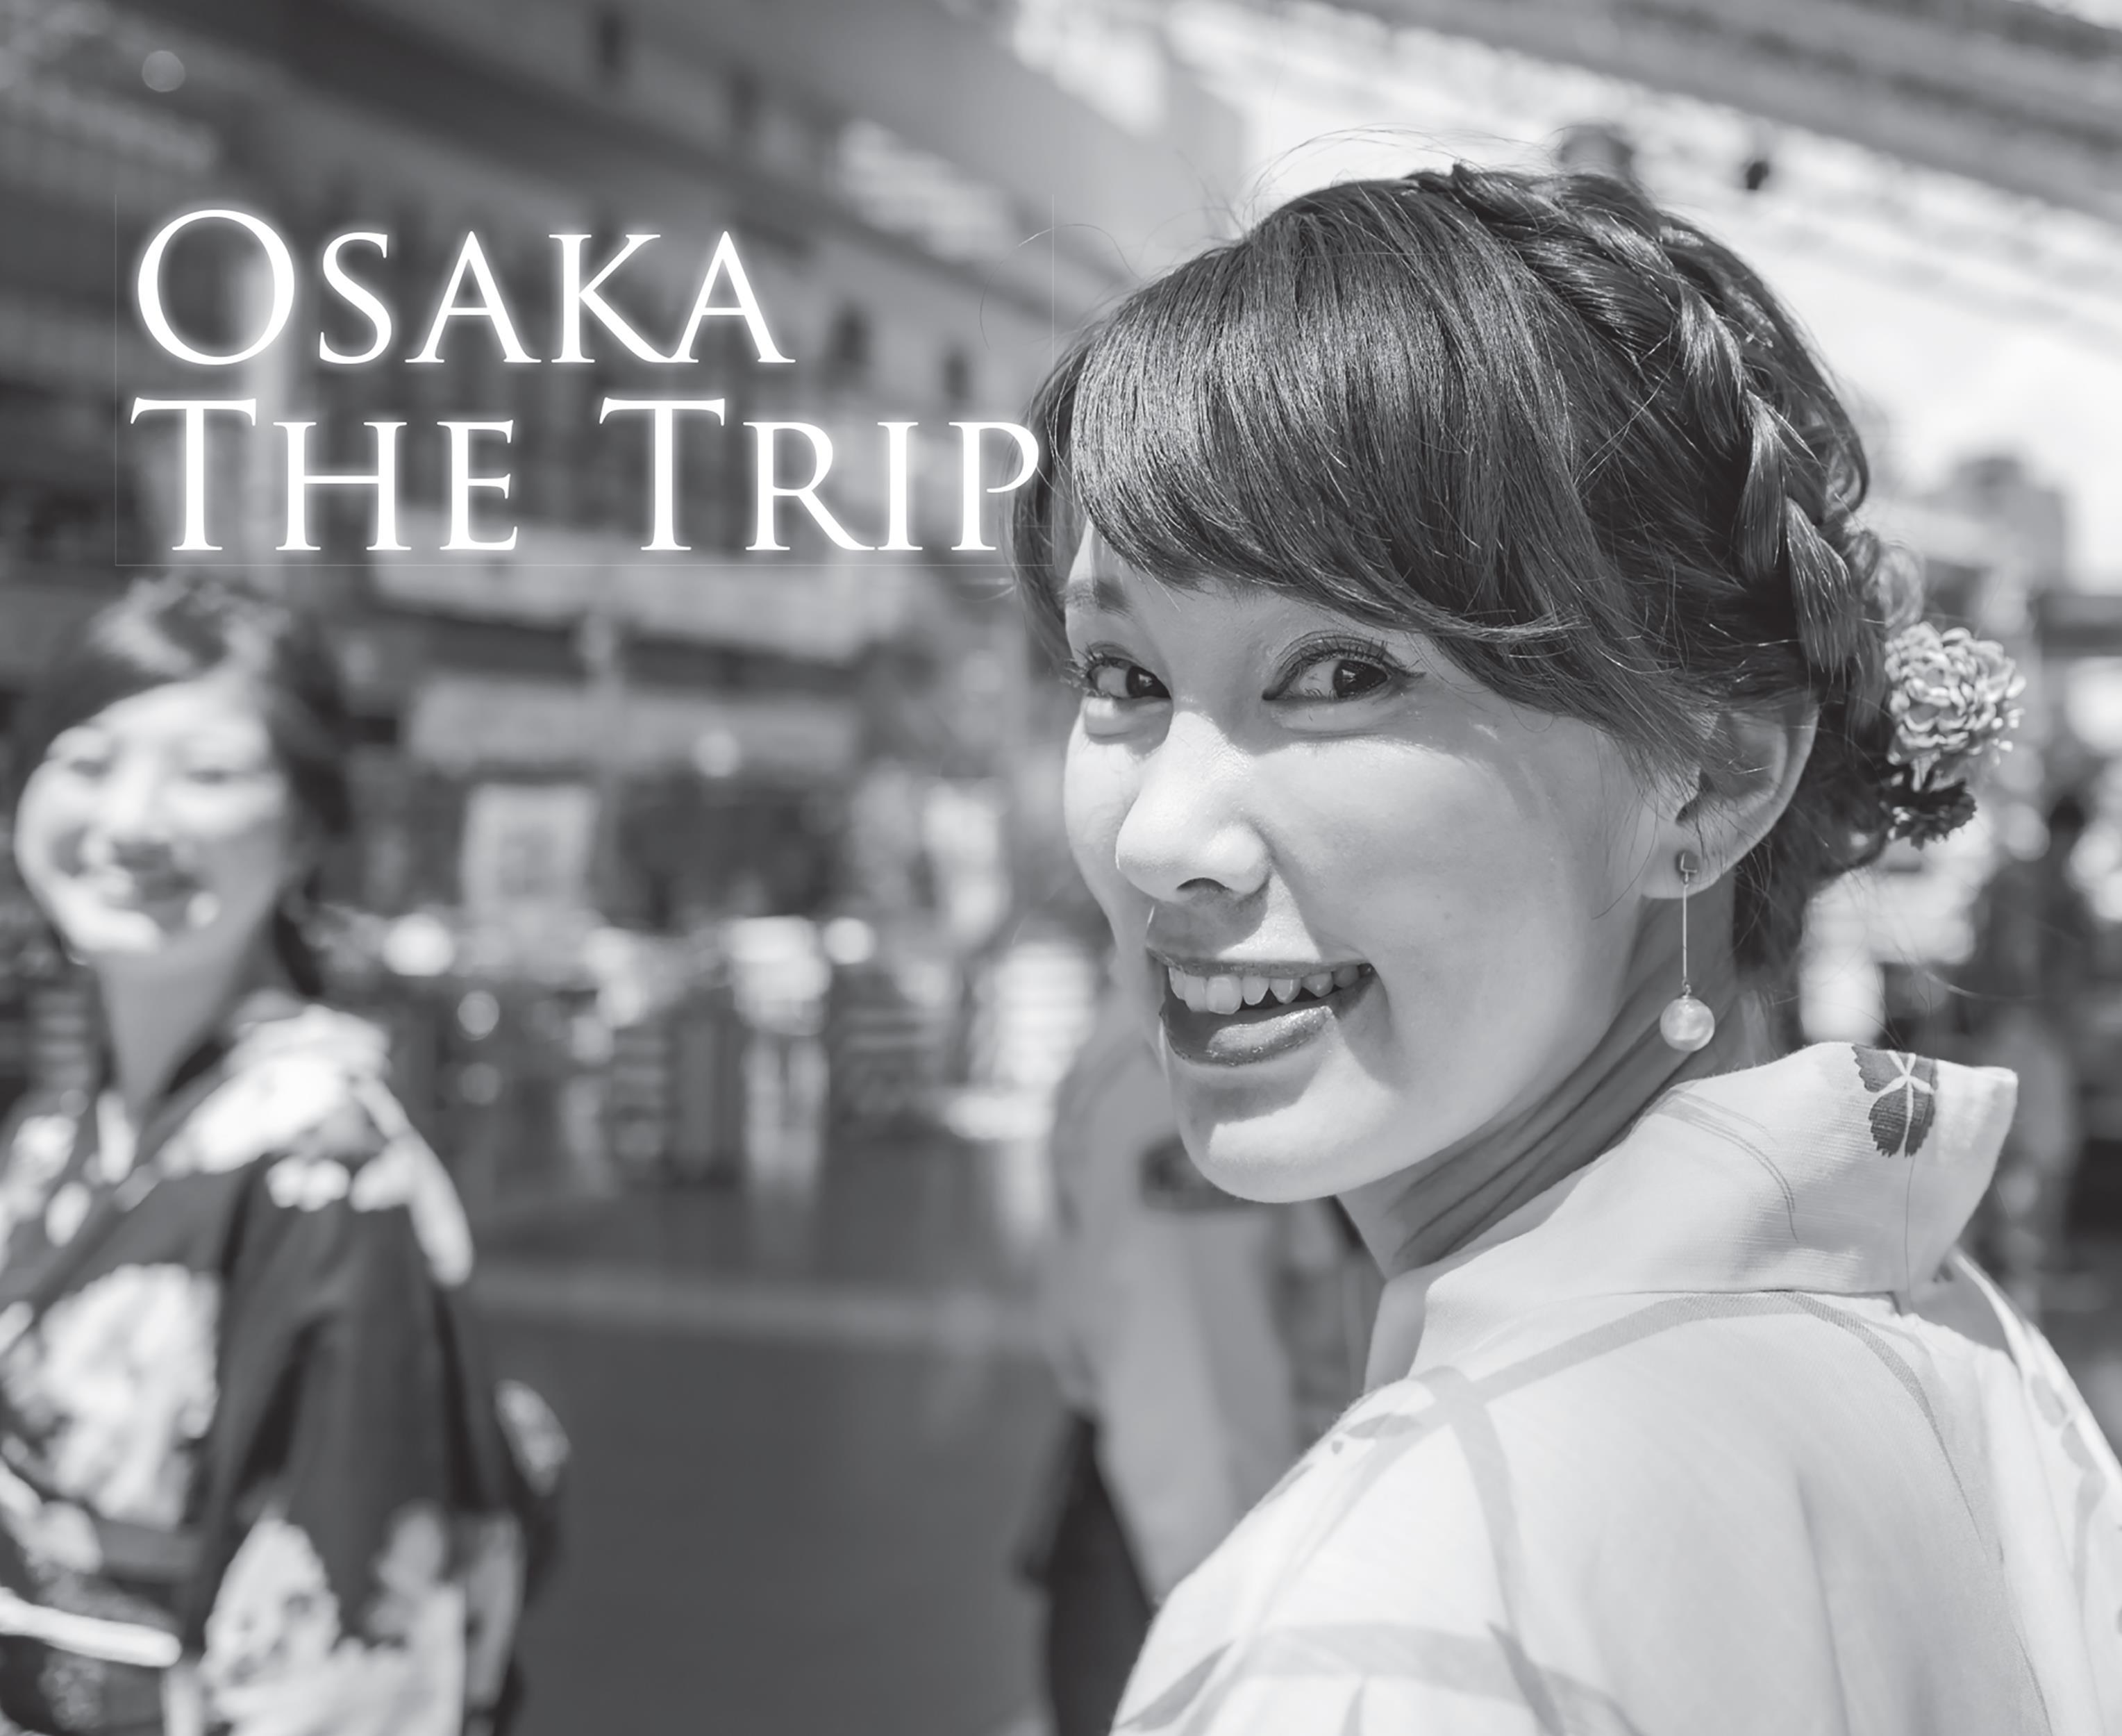 Osaka The Trip